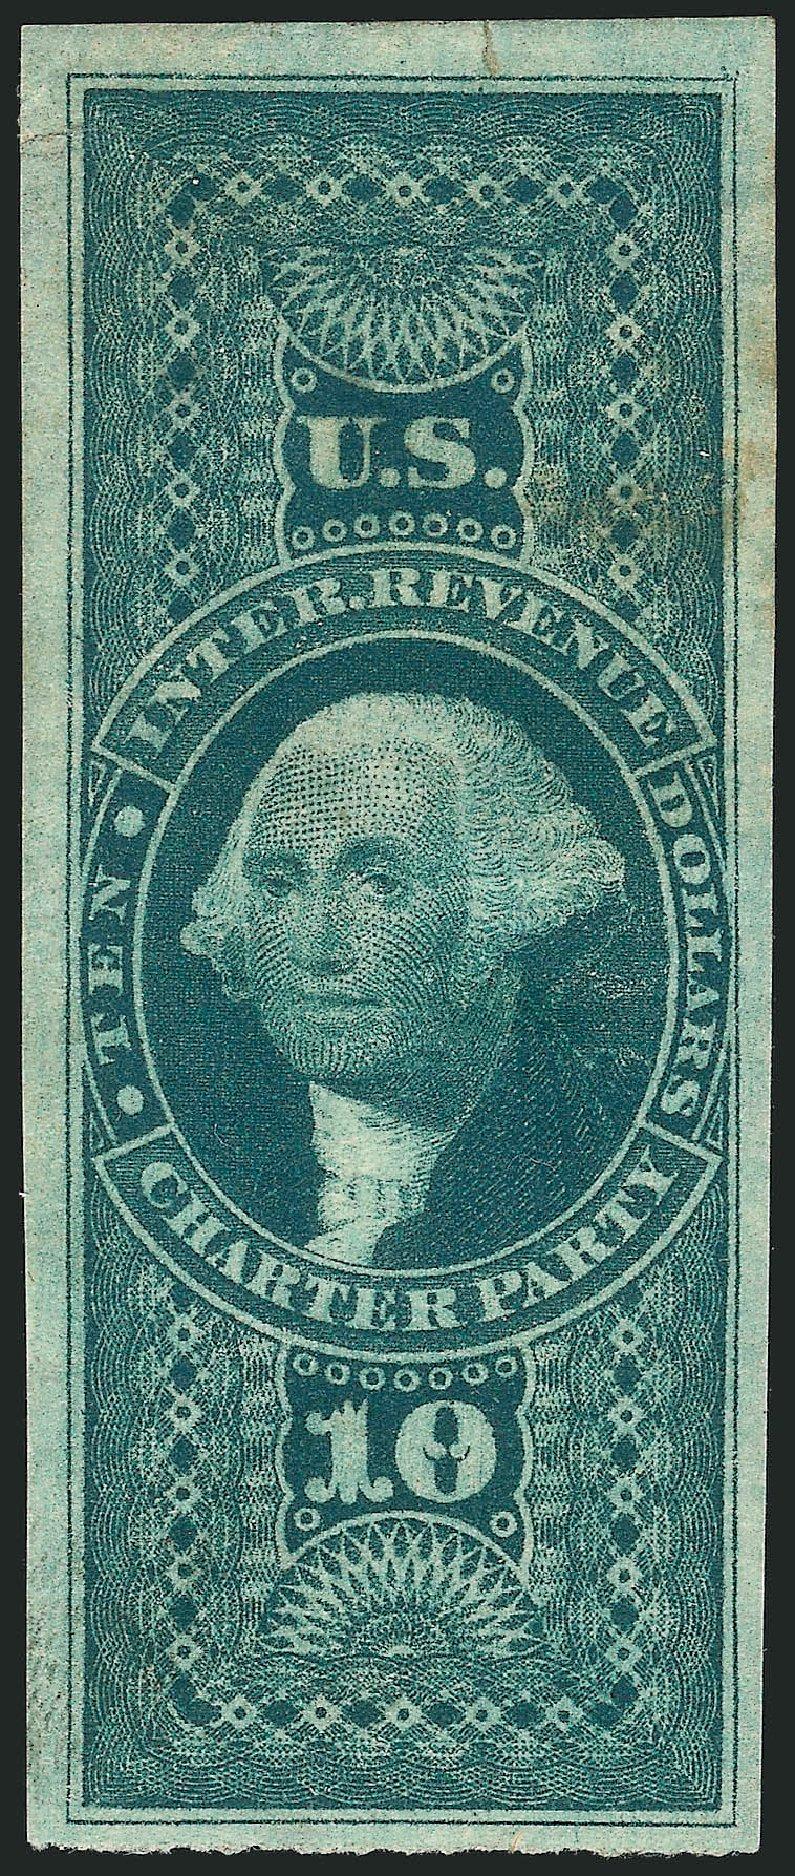 Prices of US Stamps Scott Cat. R93: 1862 US$10.00 Revenue Charter Party. Robert Siegel Auction Galleries, Dec 2014, Sale 1089, Lot 260